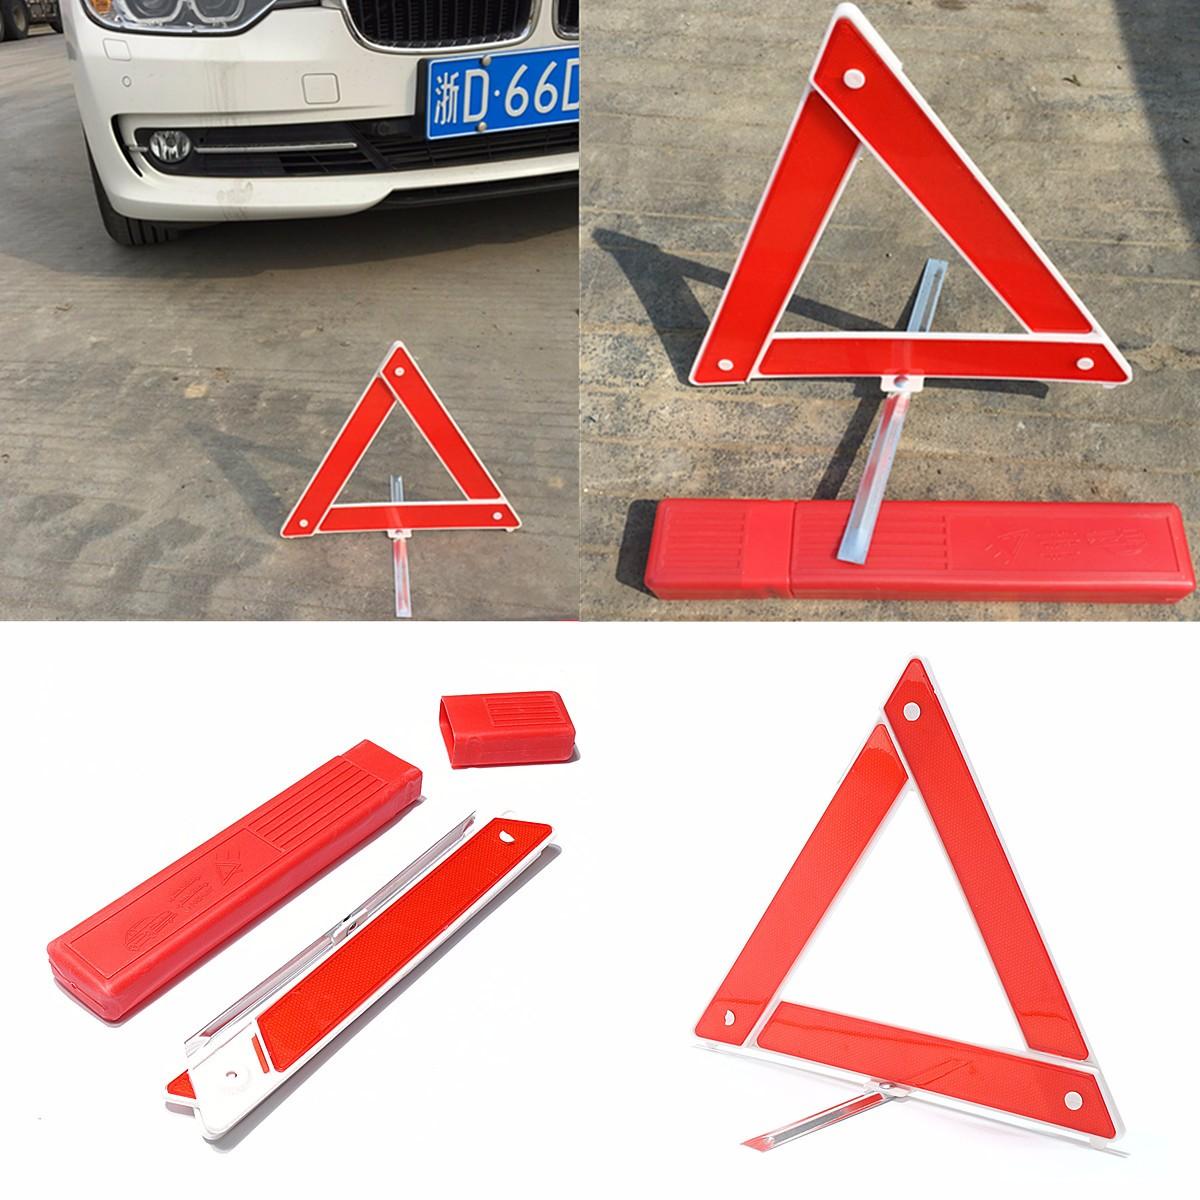 kit auto triangle voiture portable signalisation alarme r fl chissante s curit achat vente. Black Bedroom Furniture Sets. Home Design Ideas